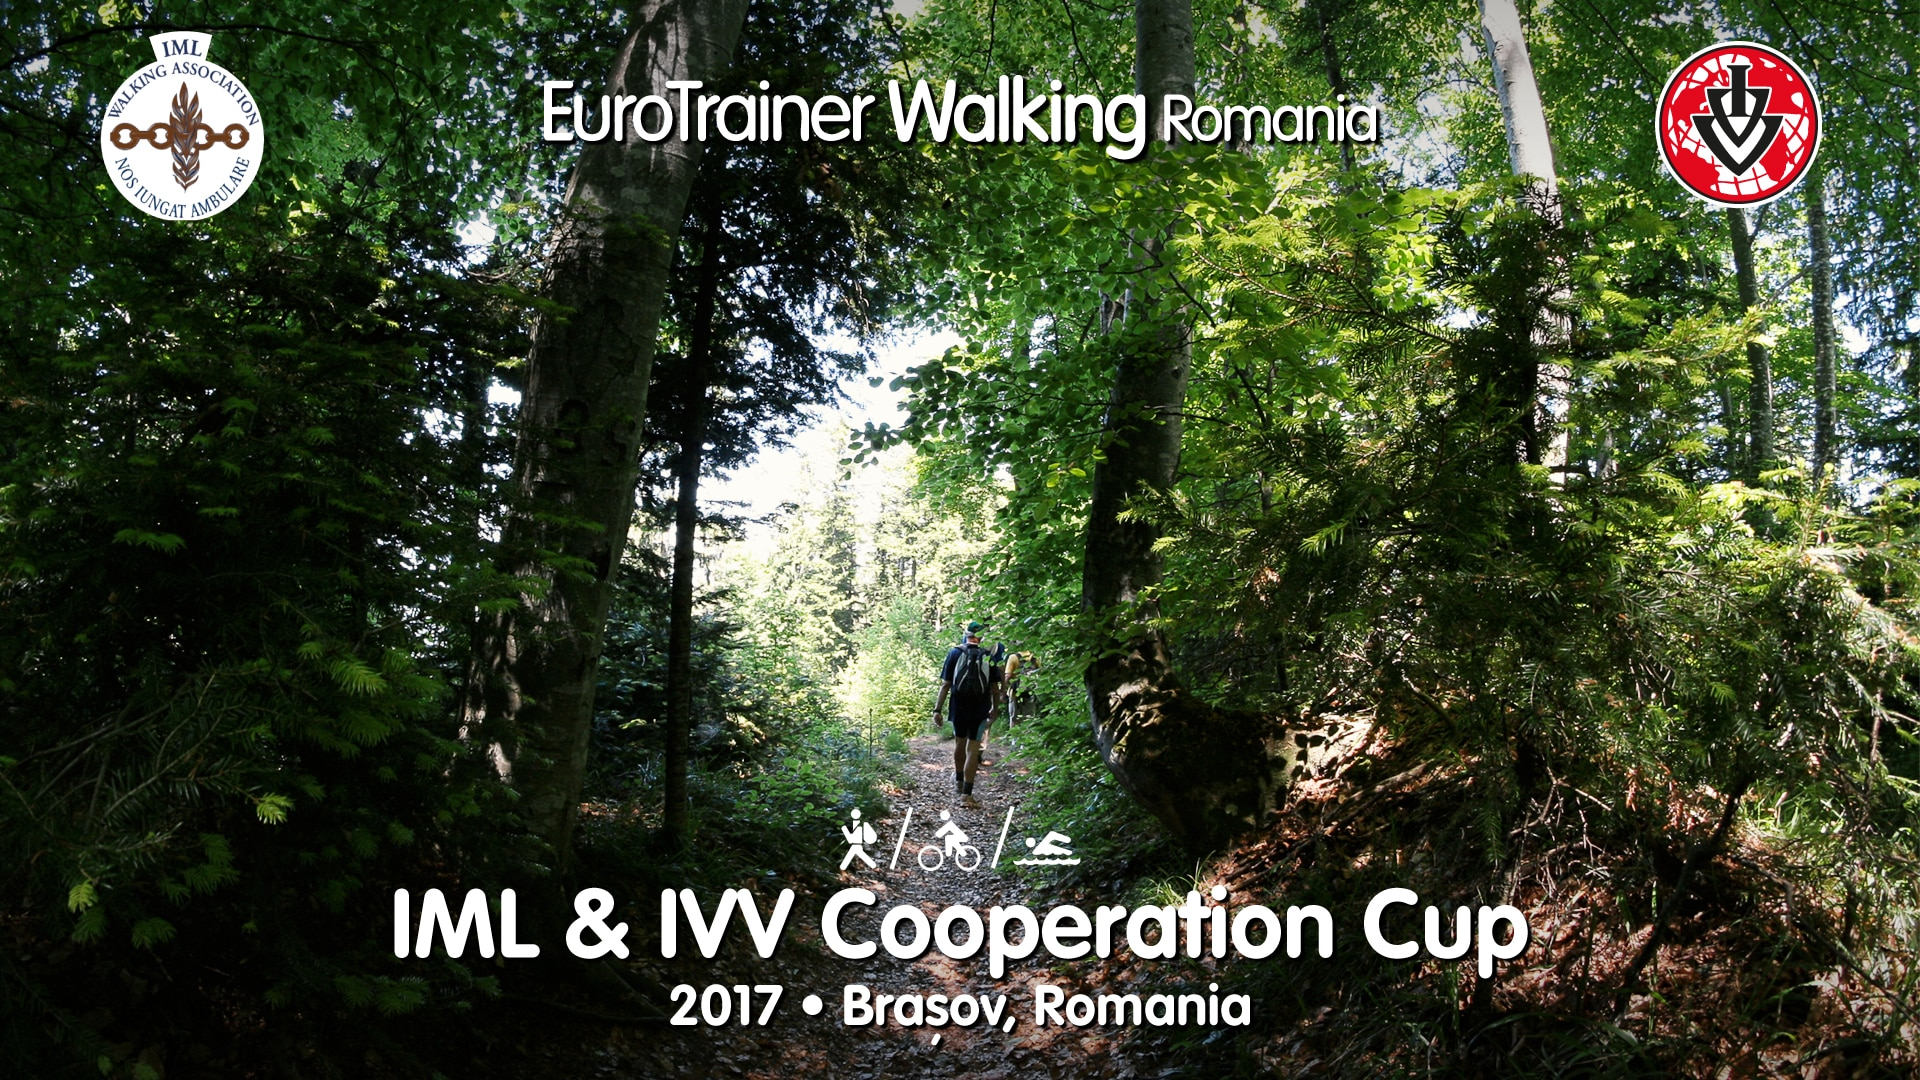 IML & IVV Cooperation Cup - 2017 • Brașov, Romania